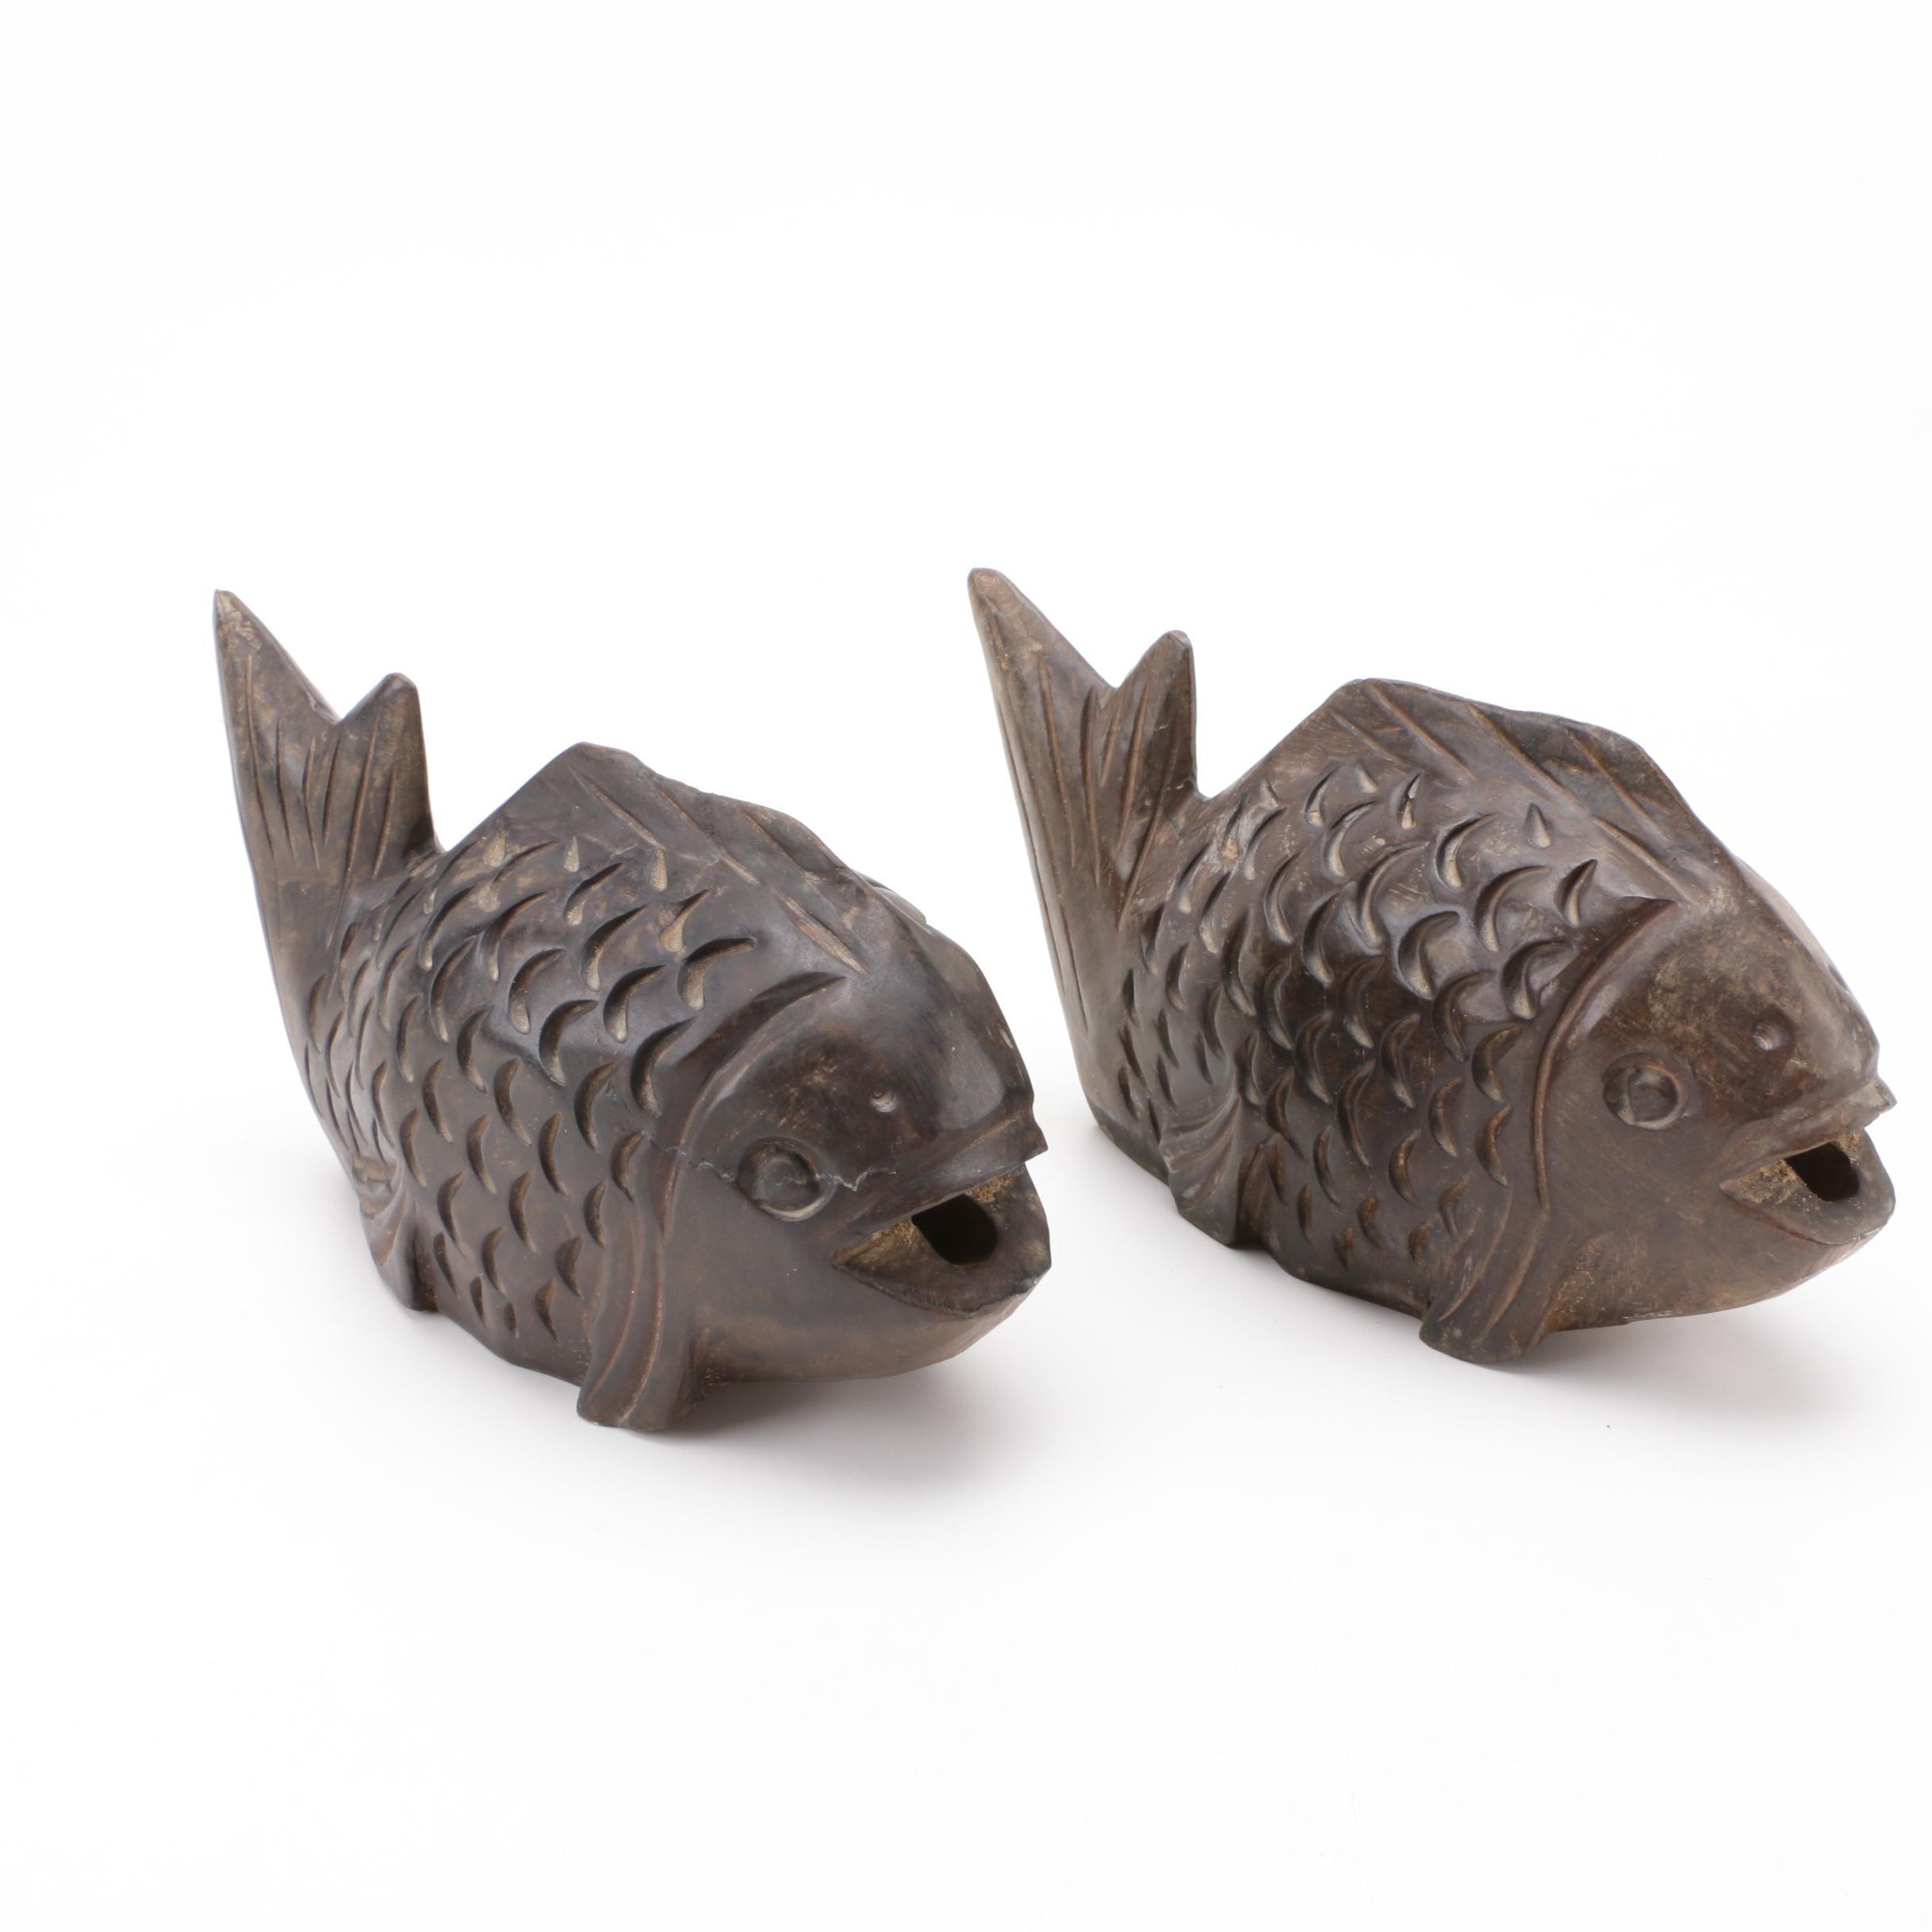 Pair of Iron Alloy Fish Figurines